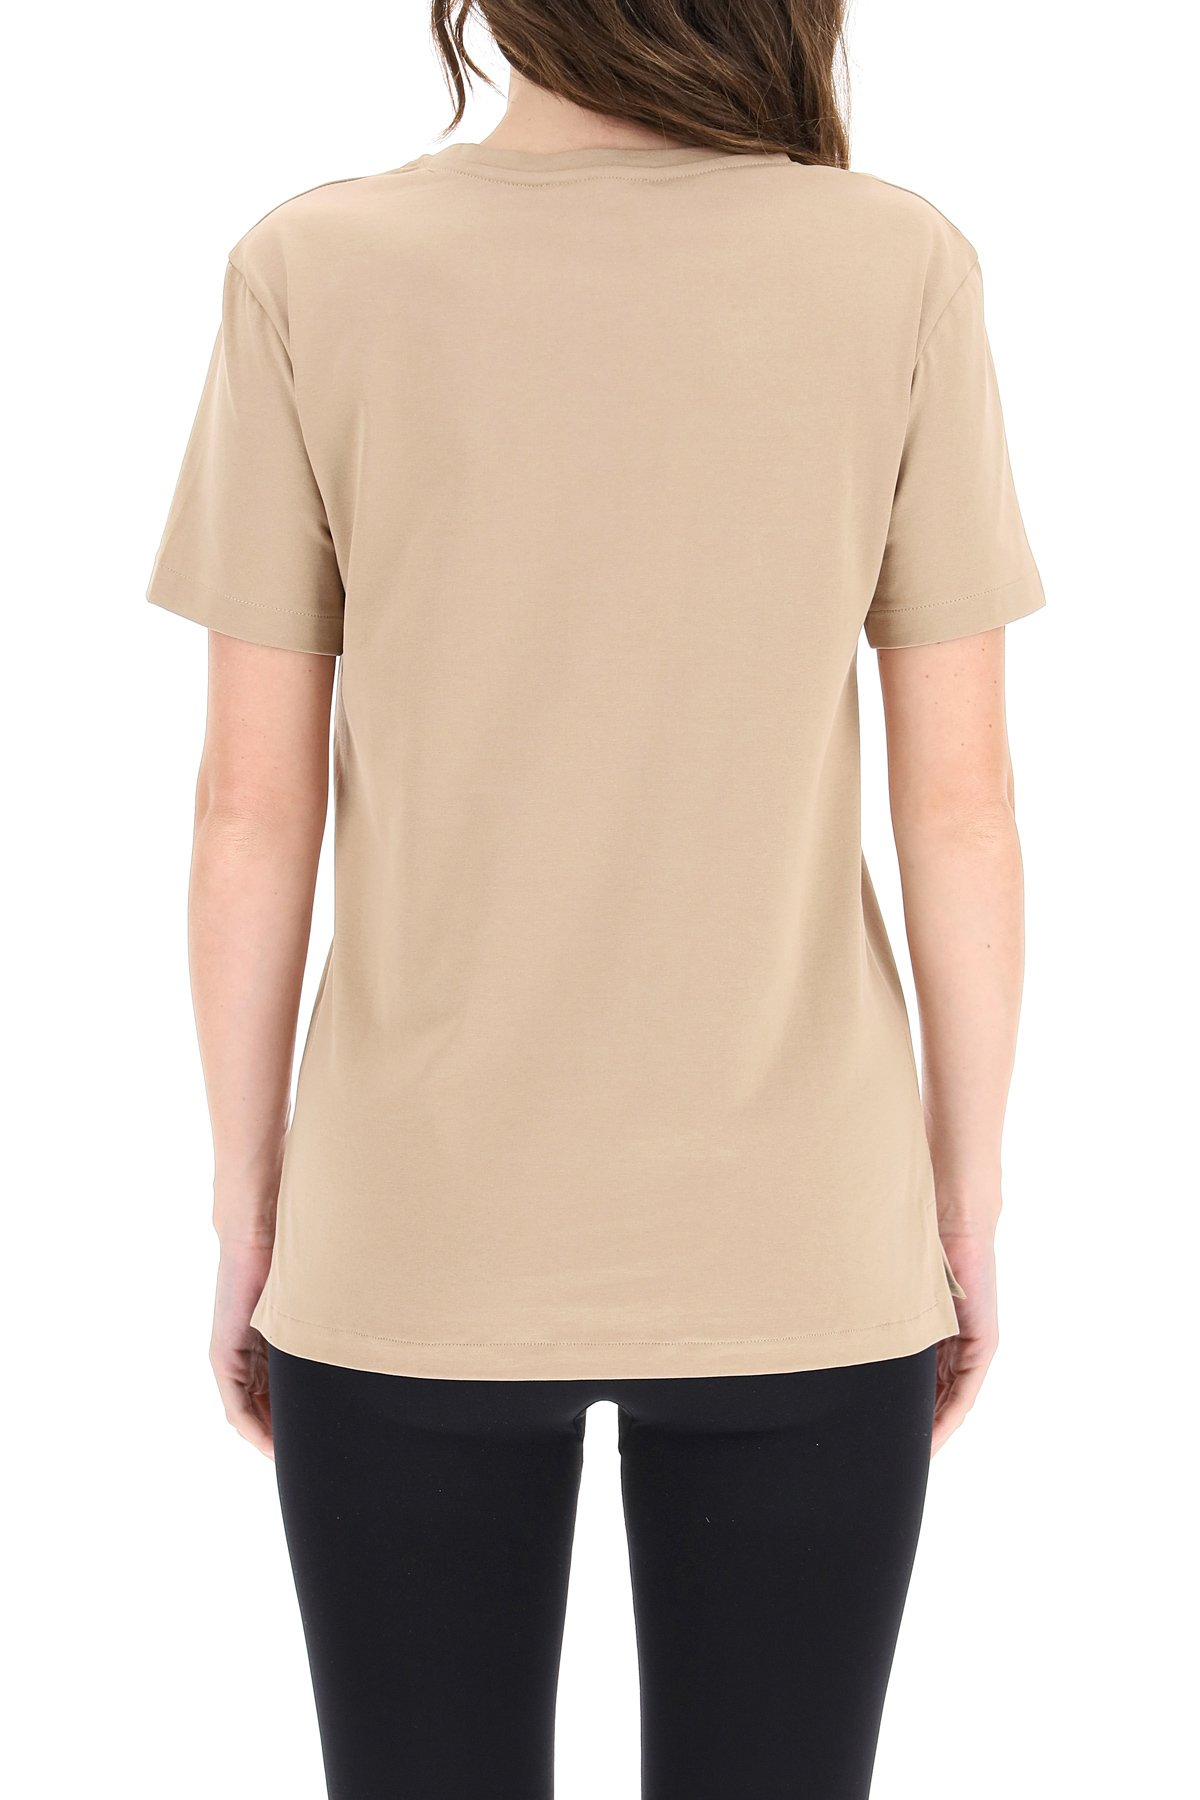 's max mara t-shirt acqui